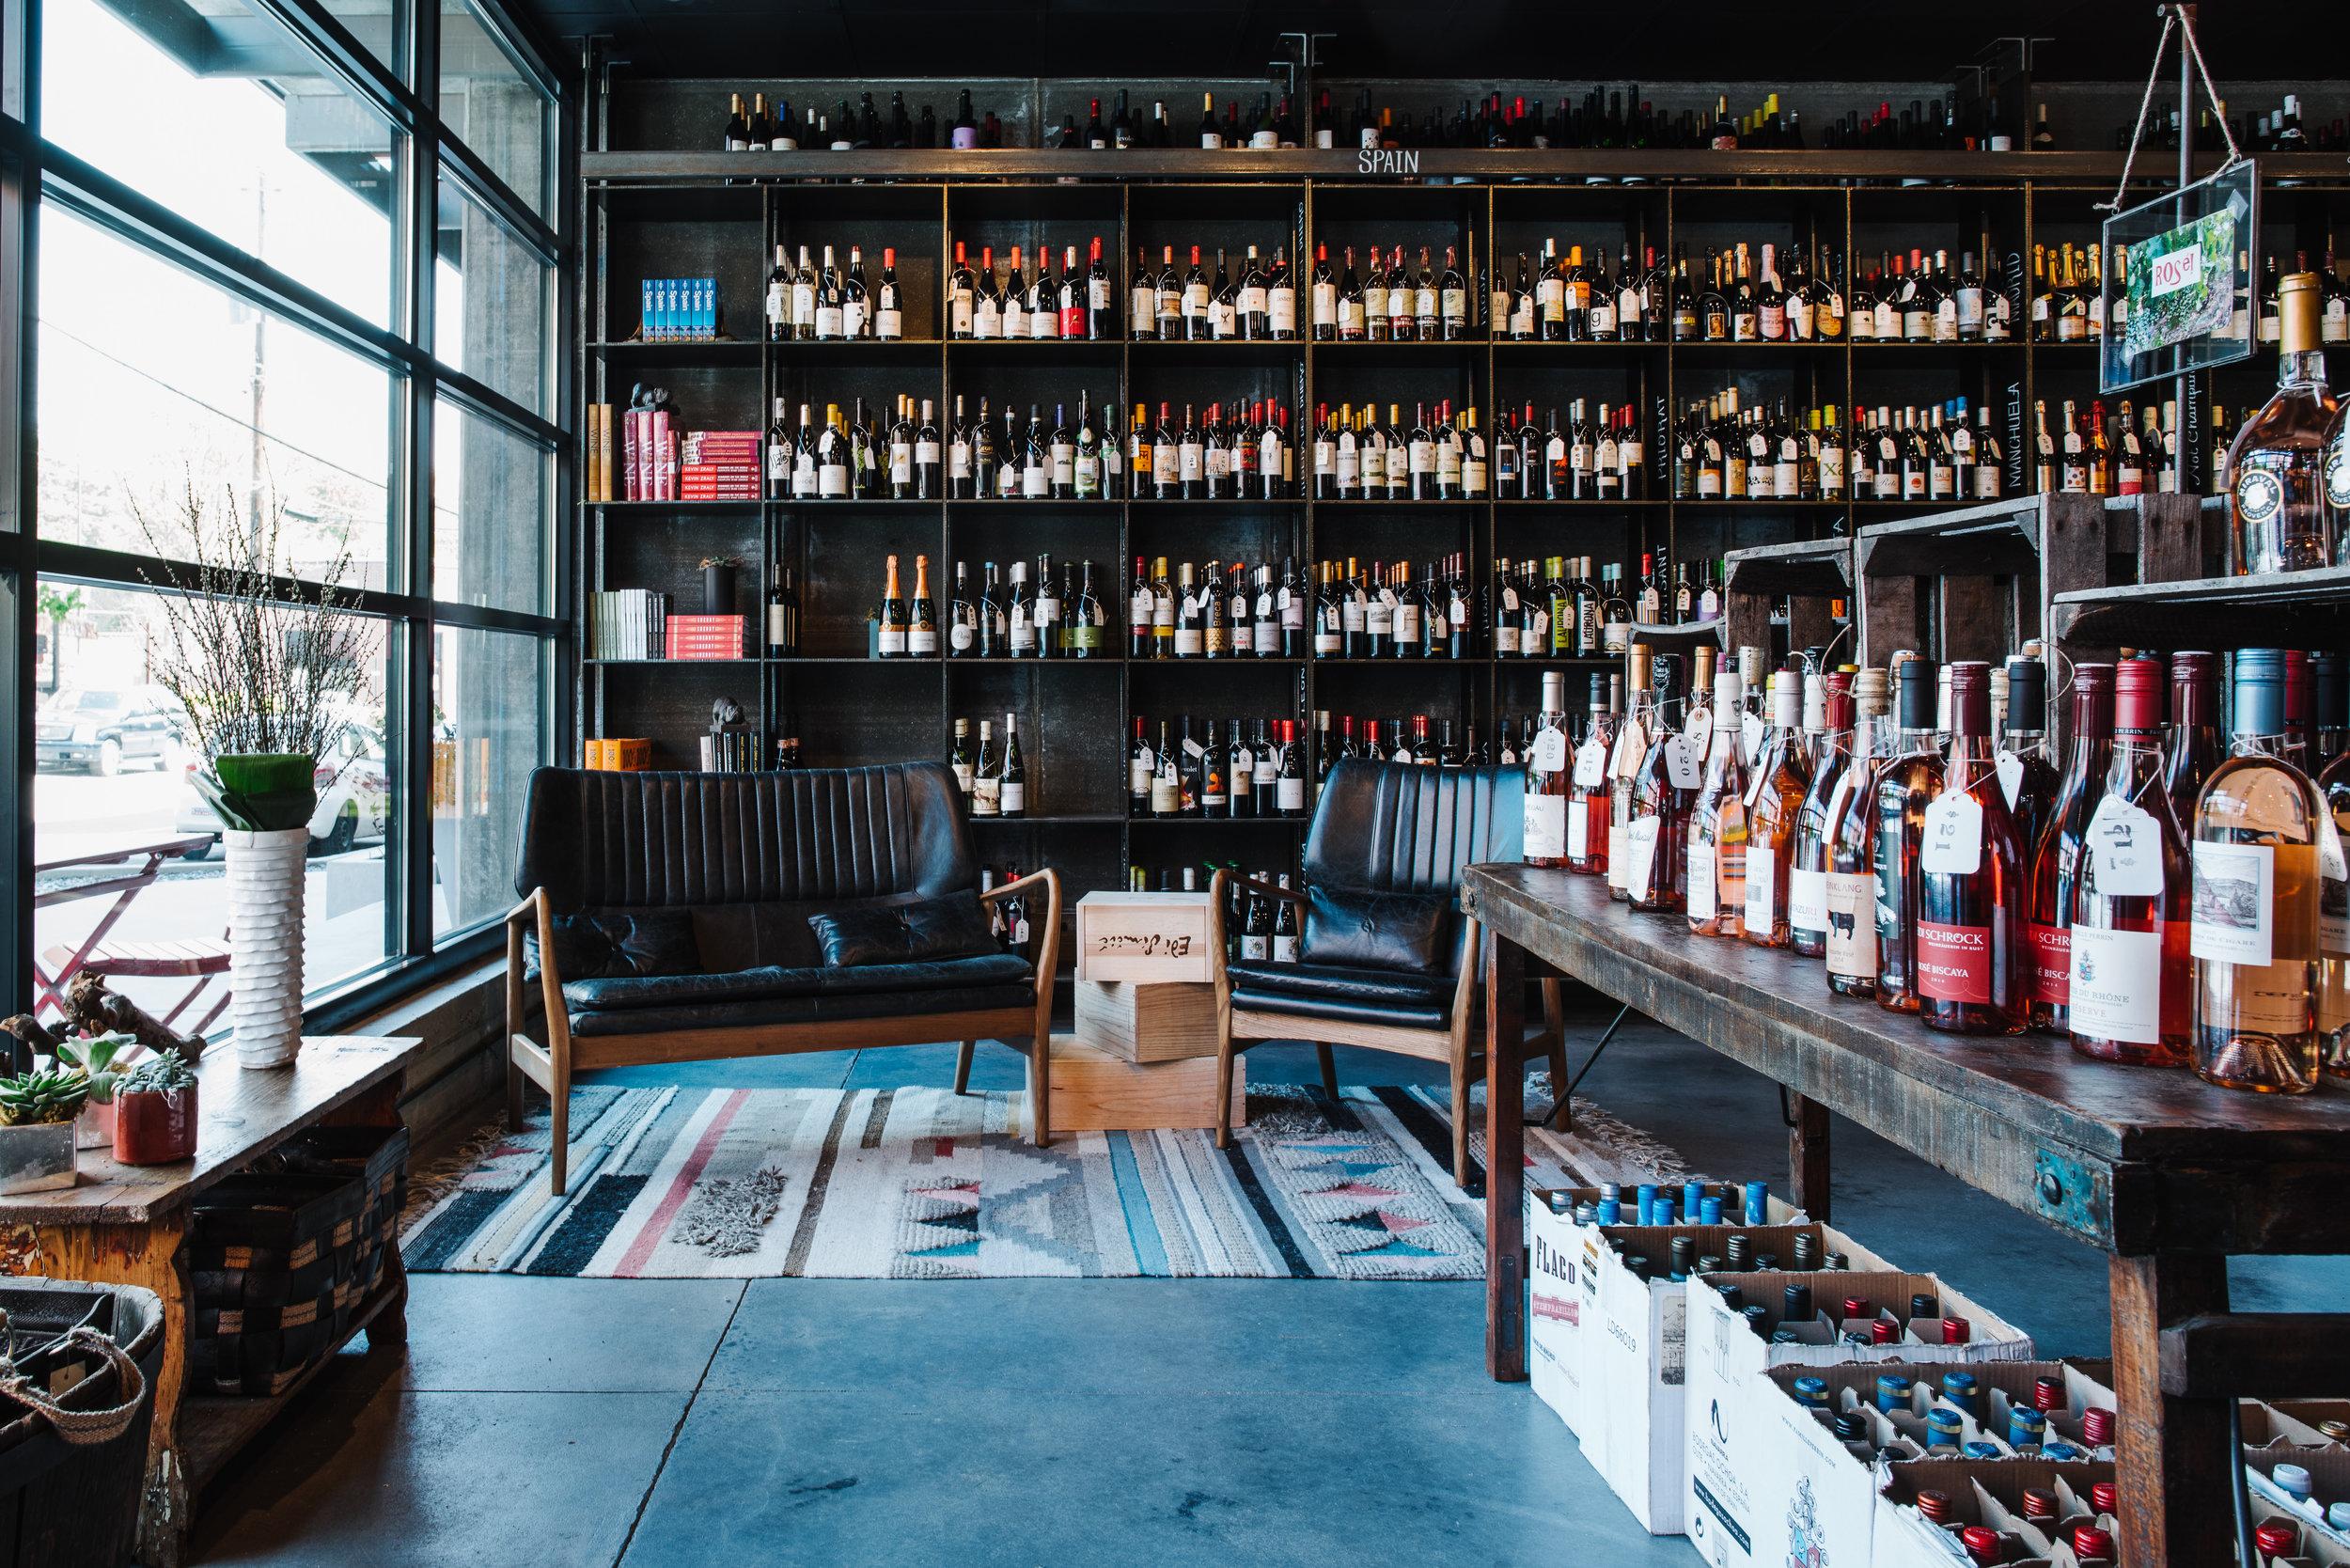 Vinoteca Best Wine Shop Retail Wine Store Inman Park Specialty Wines Rare Wines